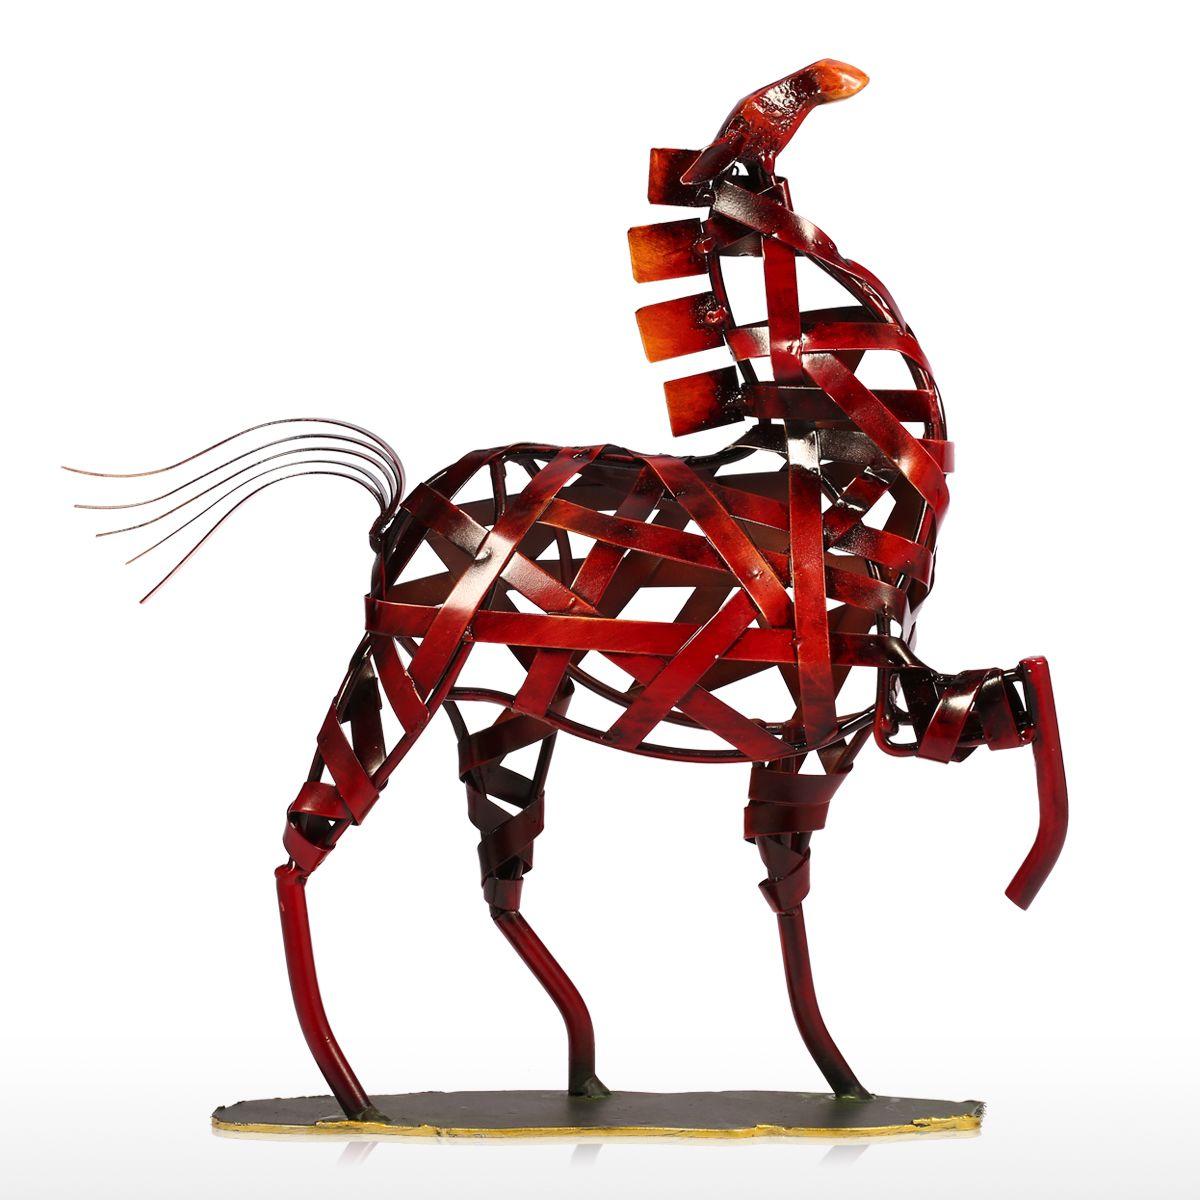 Tooarts Metal Figurine Modern Metal Vintage Home Decoration Weaving